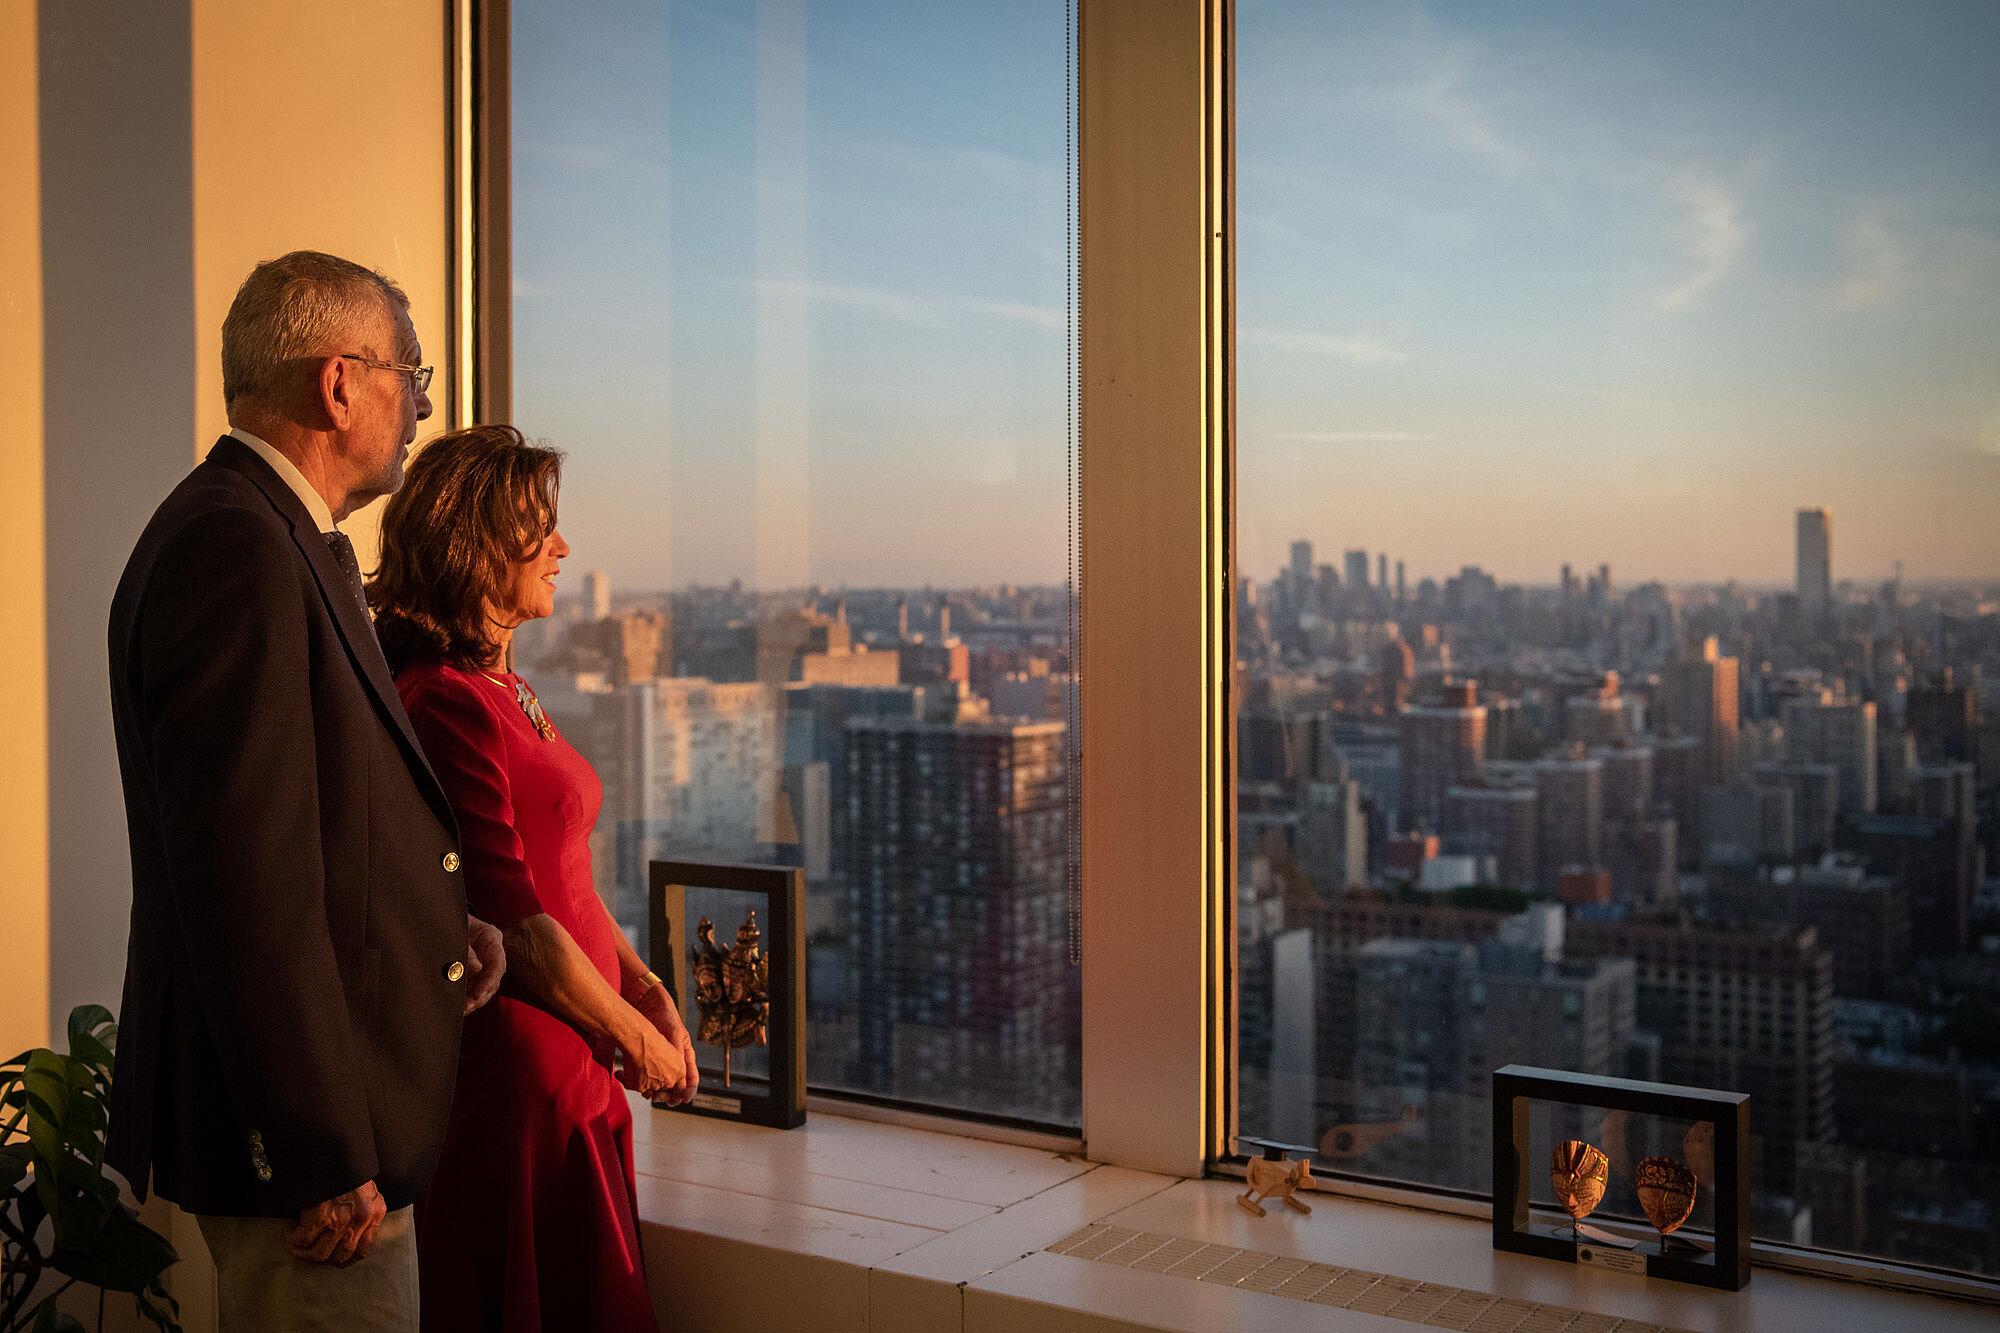 Federal President Alexander Van der Bellen and Federal Chancellor Brigitte Bierlein get a glimpse of Manhattan while attending the 74th UN General Assembly in New York City.    Photo: Carina Karlovits/HBF